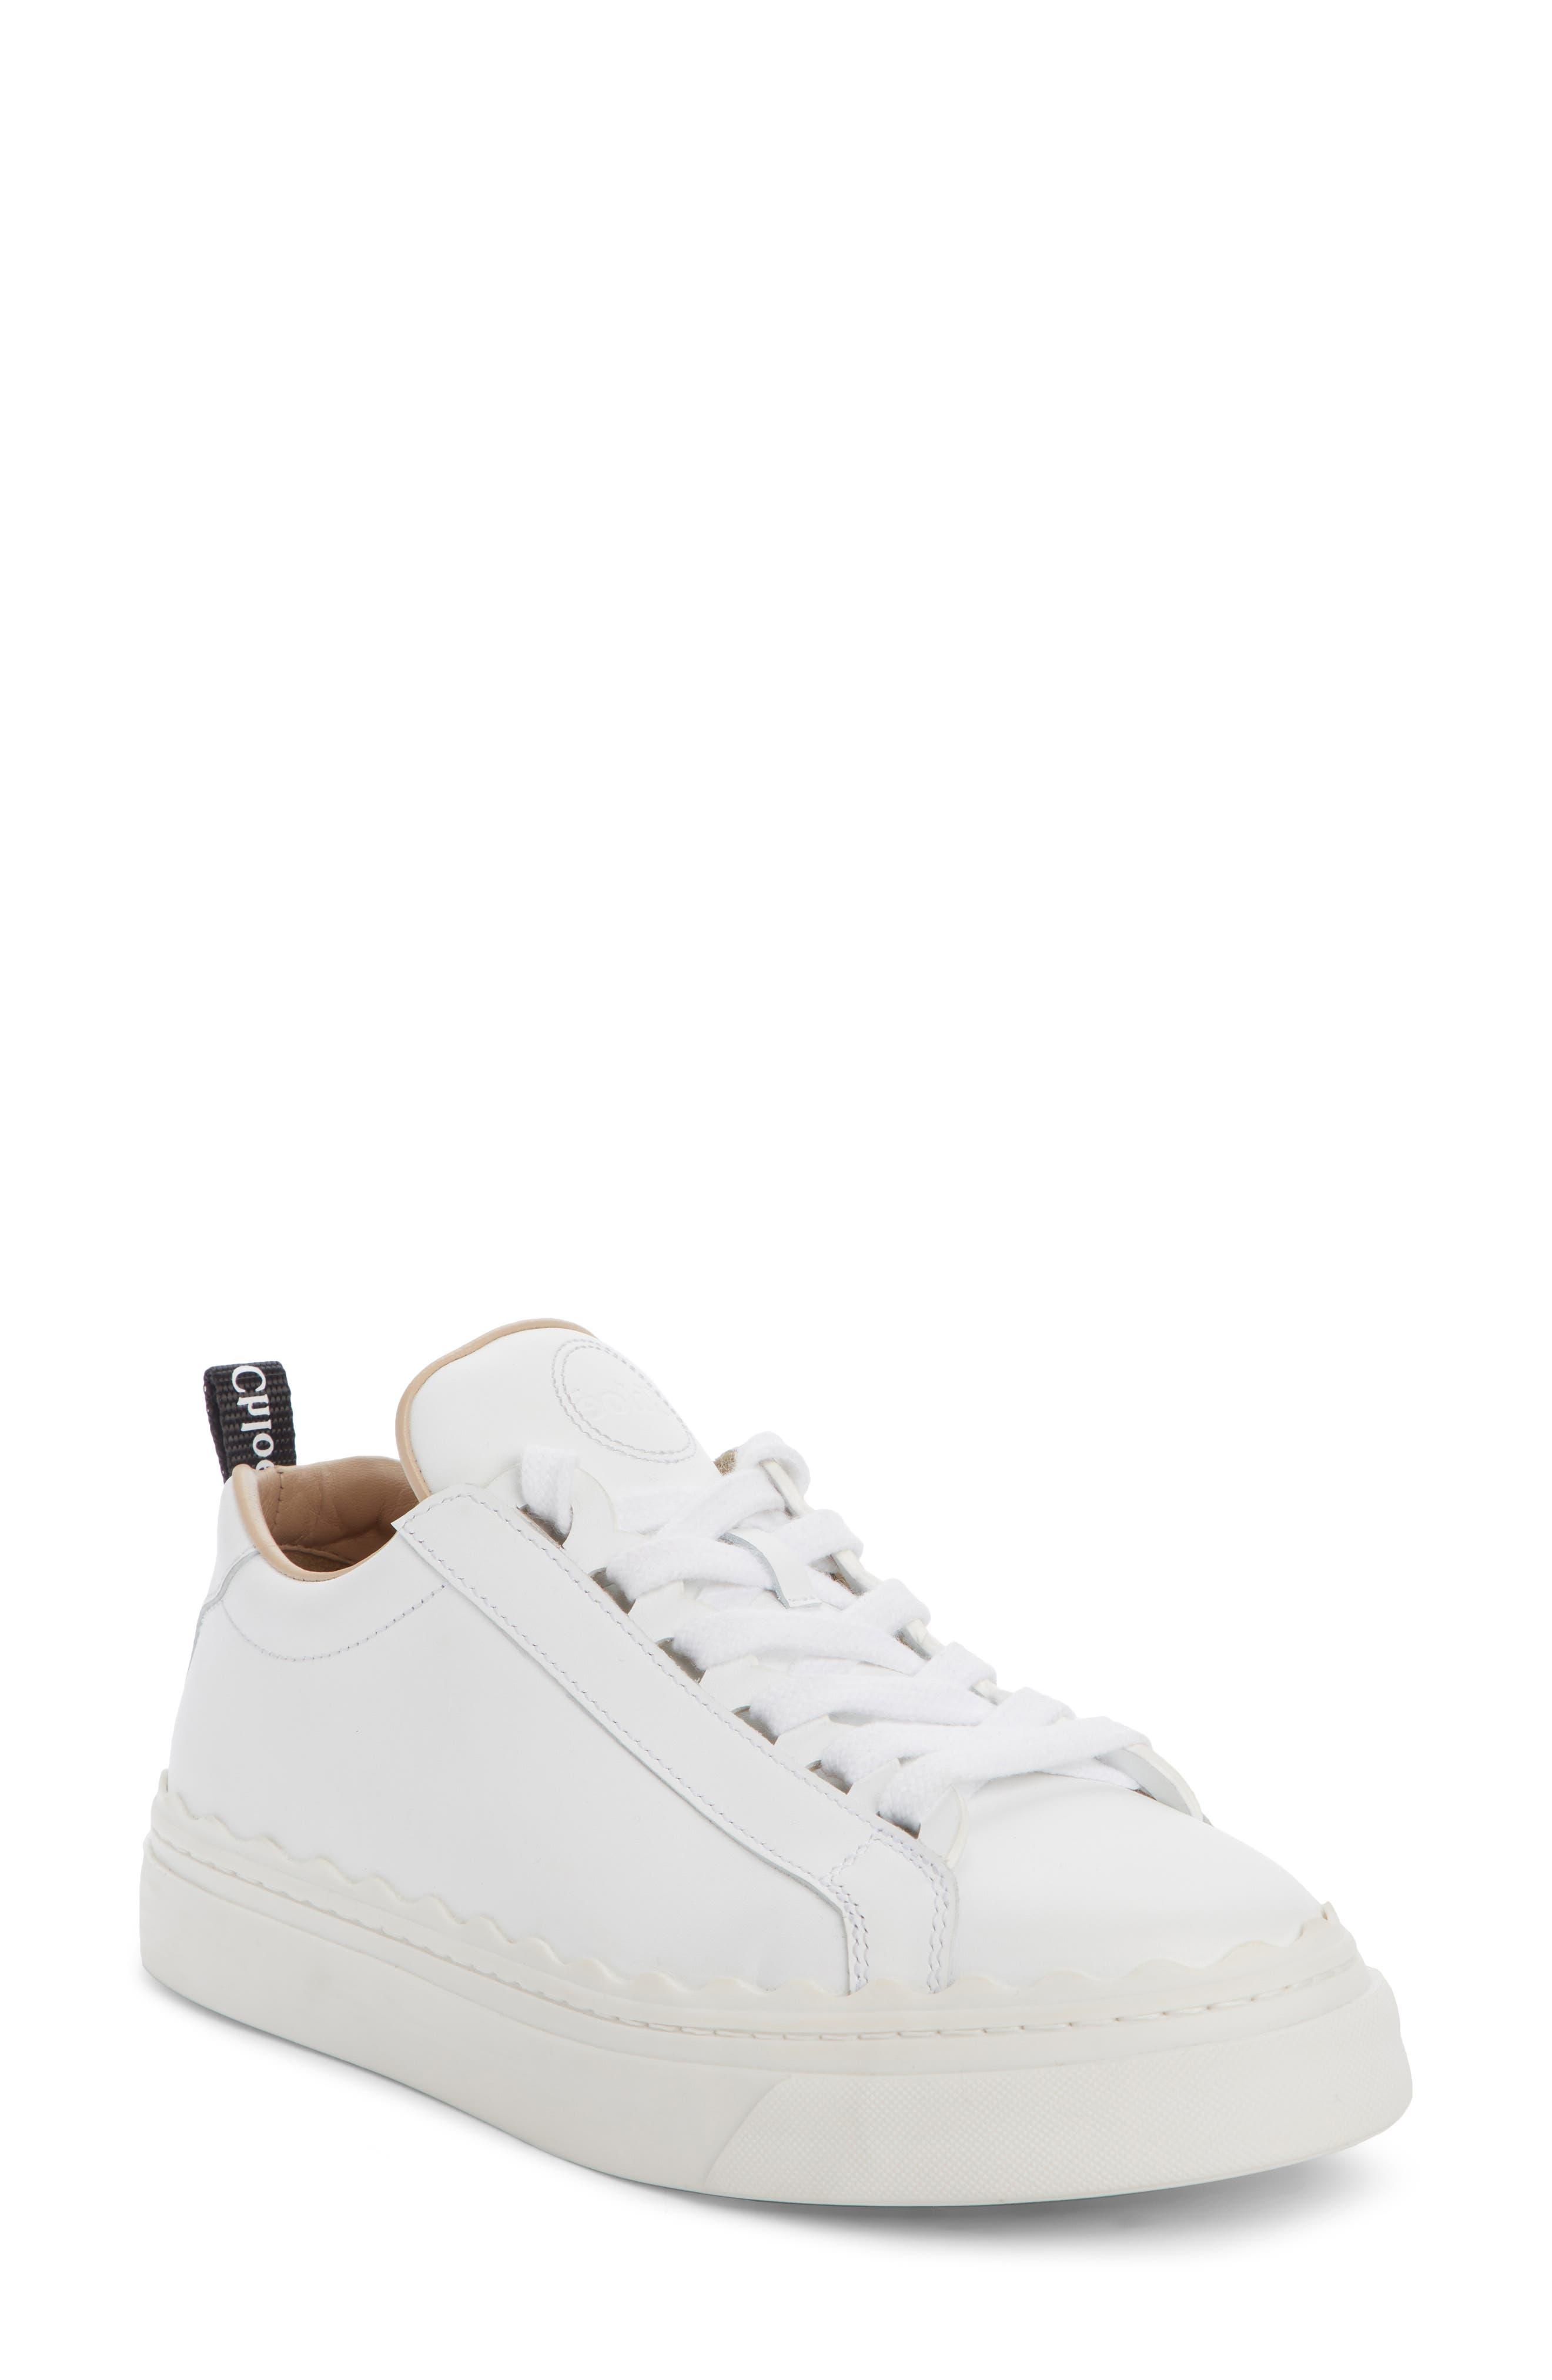 Lauren Sneaker,                             Main thumbnail 1, color,                             WHITE LEATHER